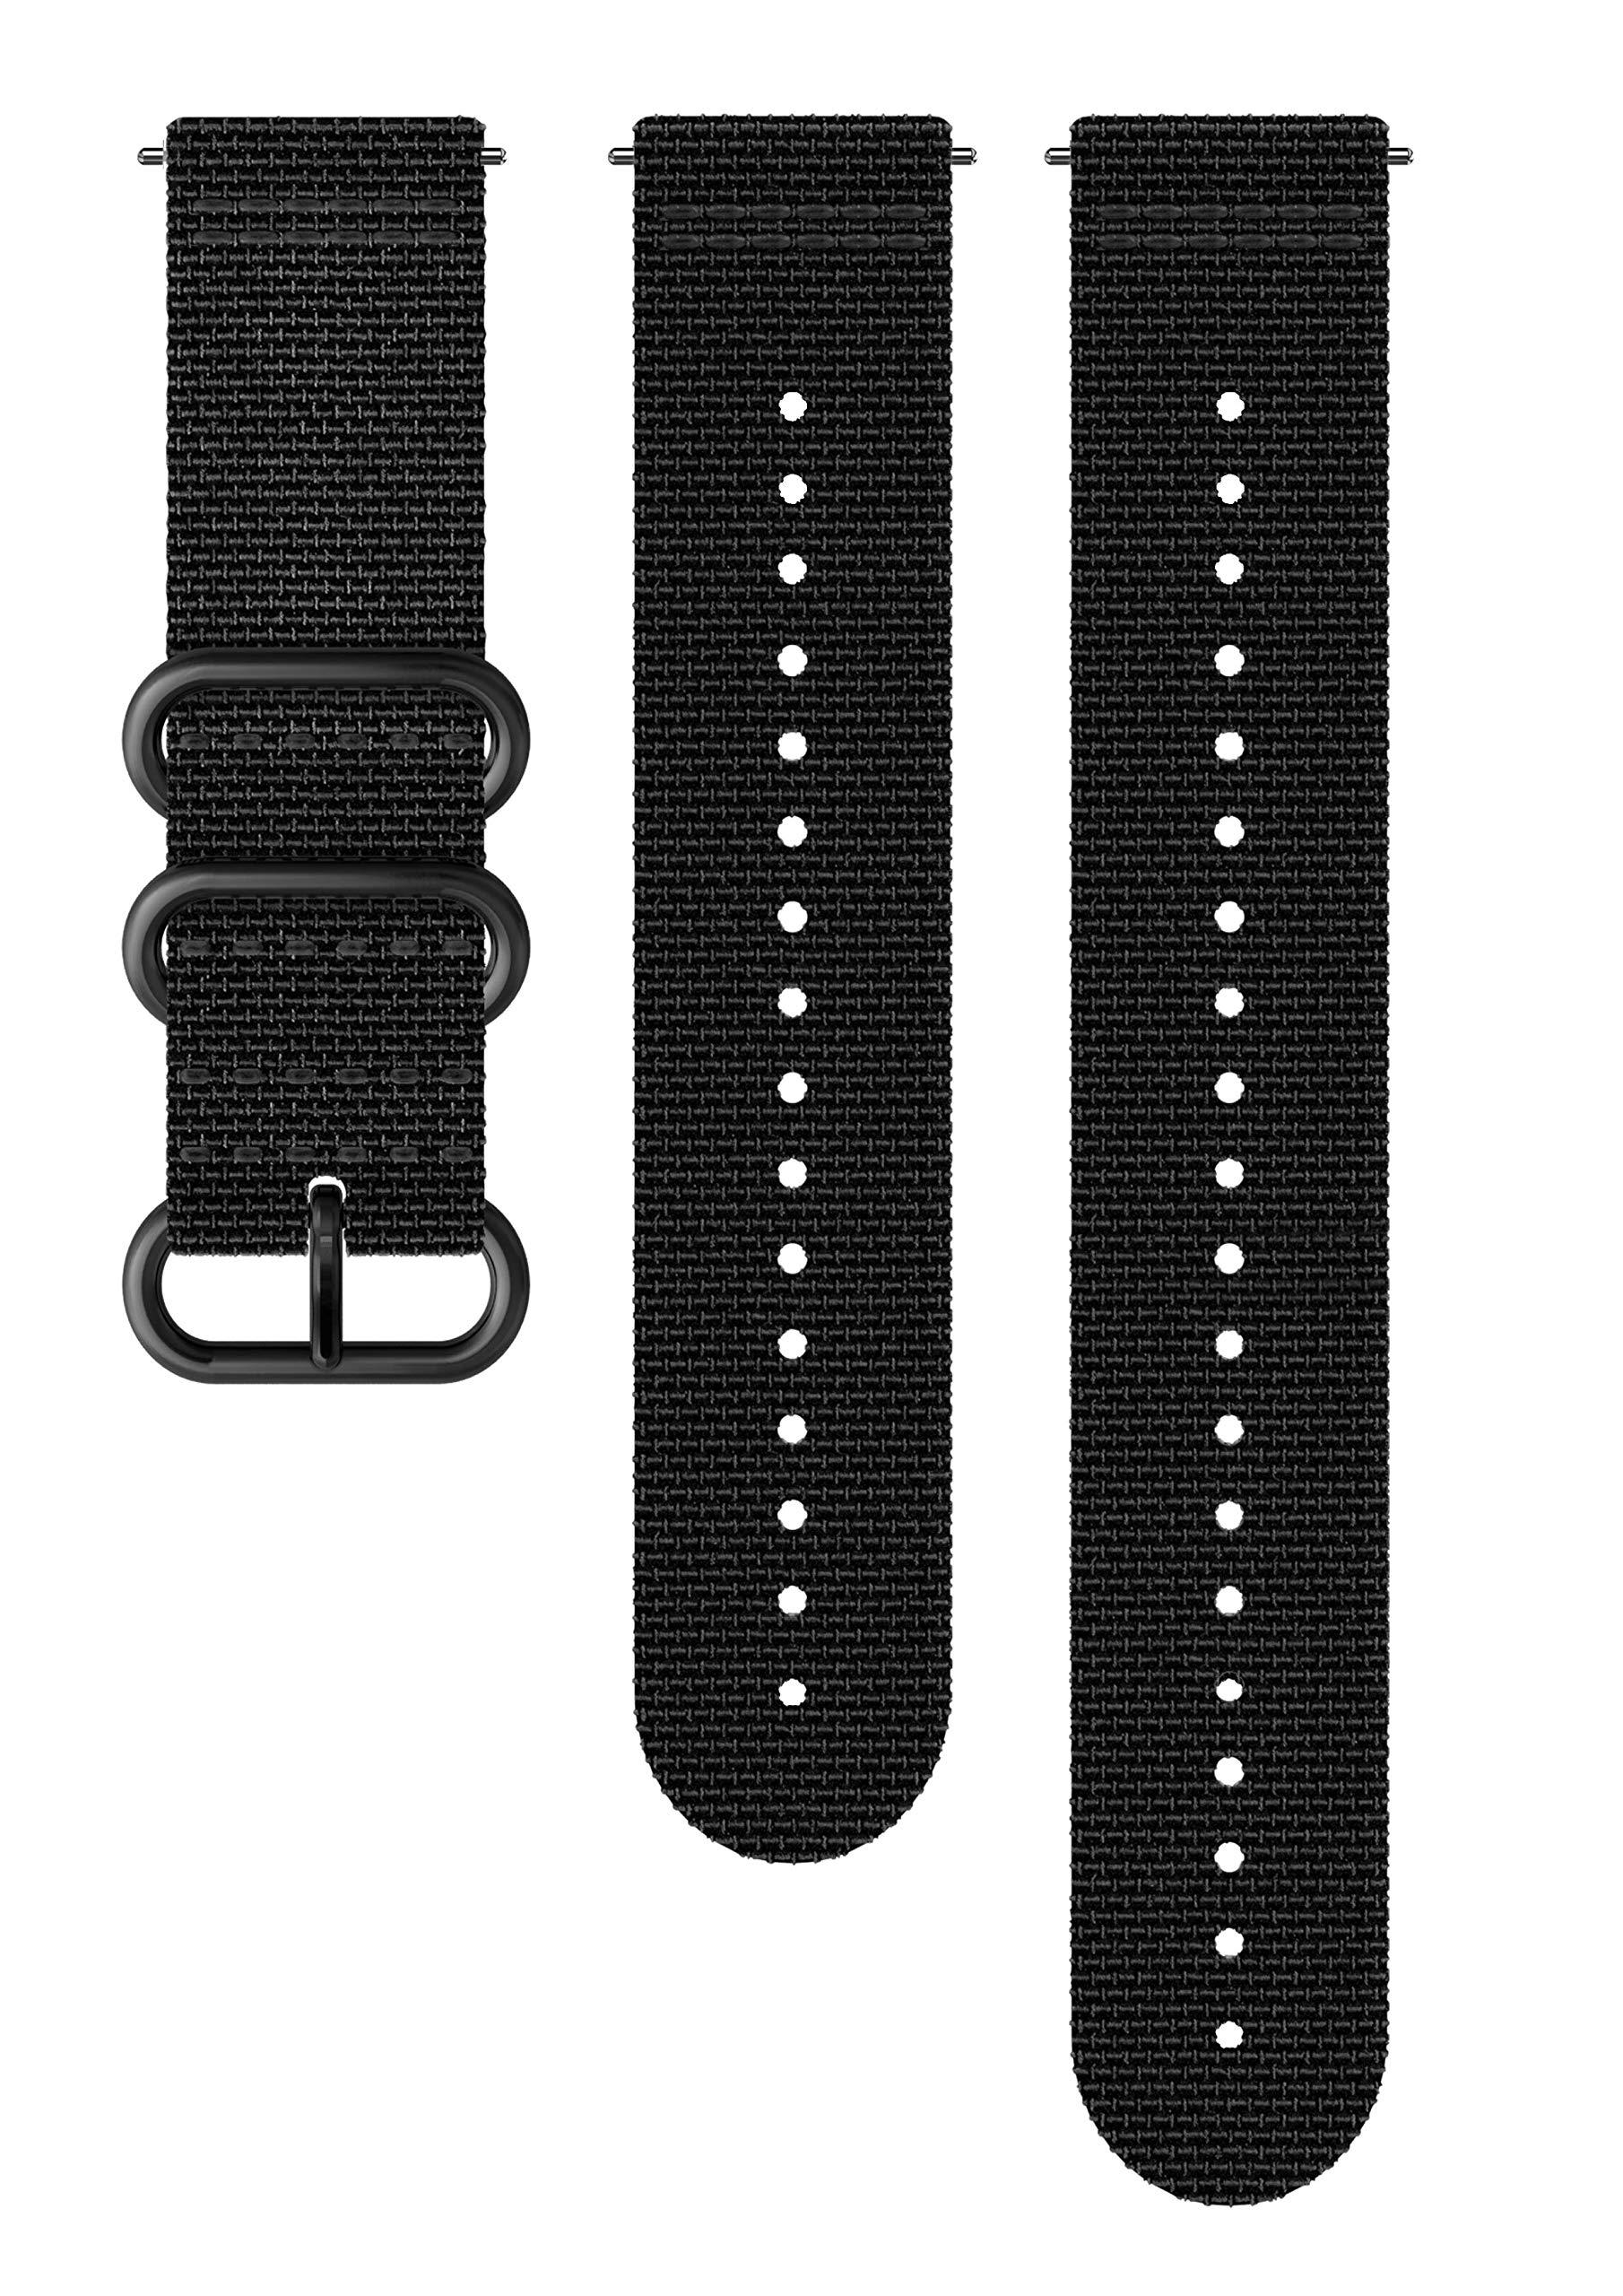 Suunto Watch Strap, 24mm, Textile, Black- Explore, M+L: 130-240 mm by Suunto